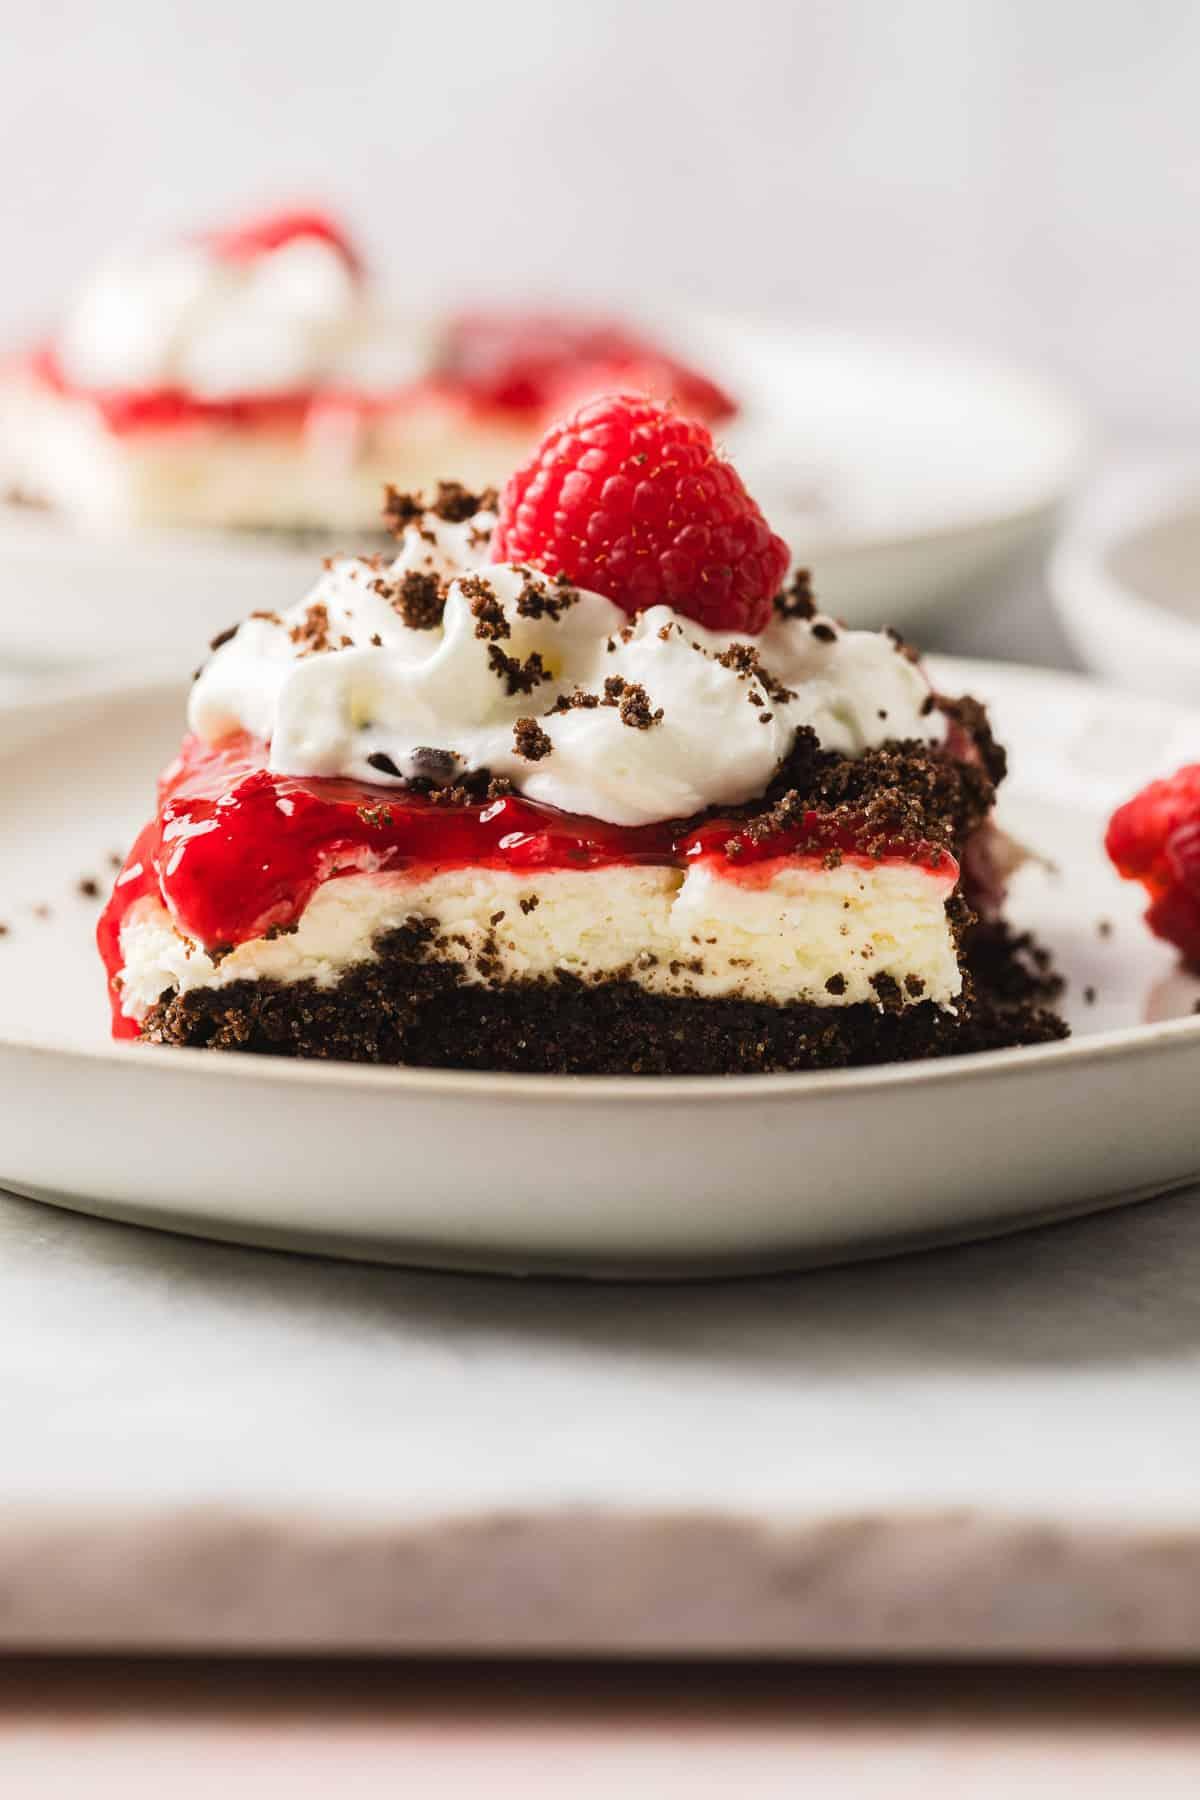 chocolate raspberry dessert on a white plate